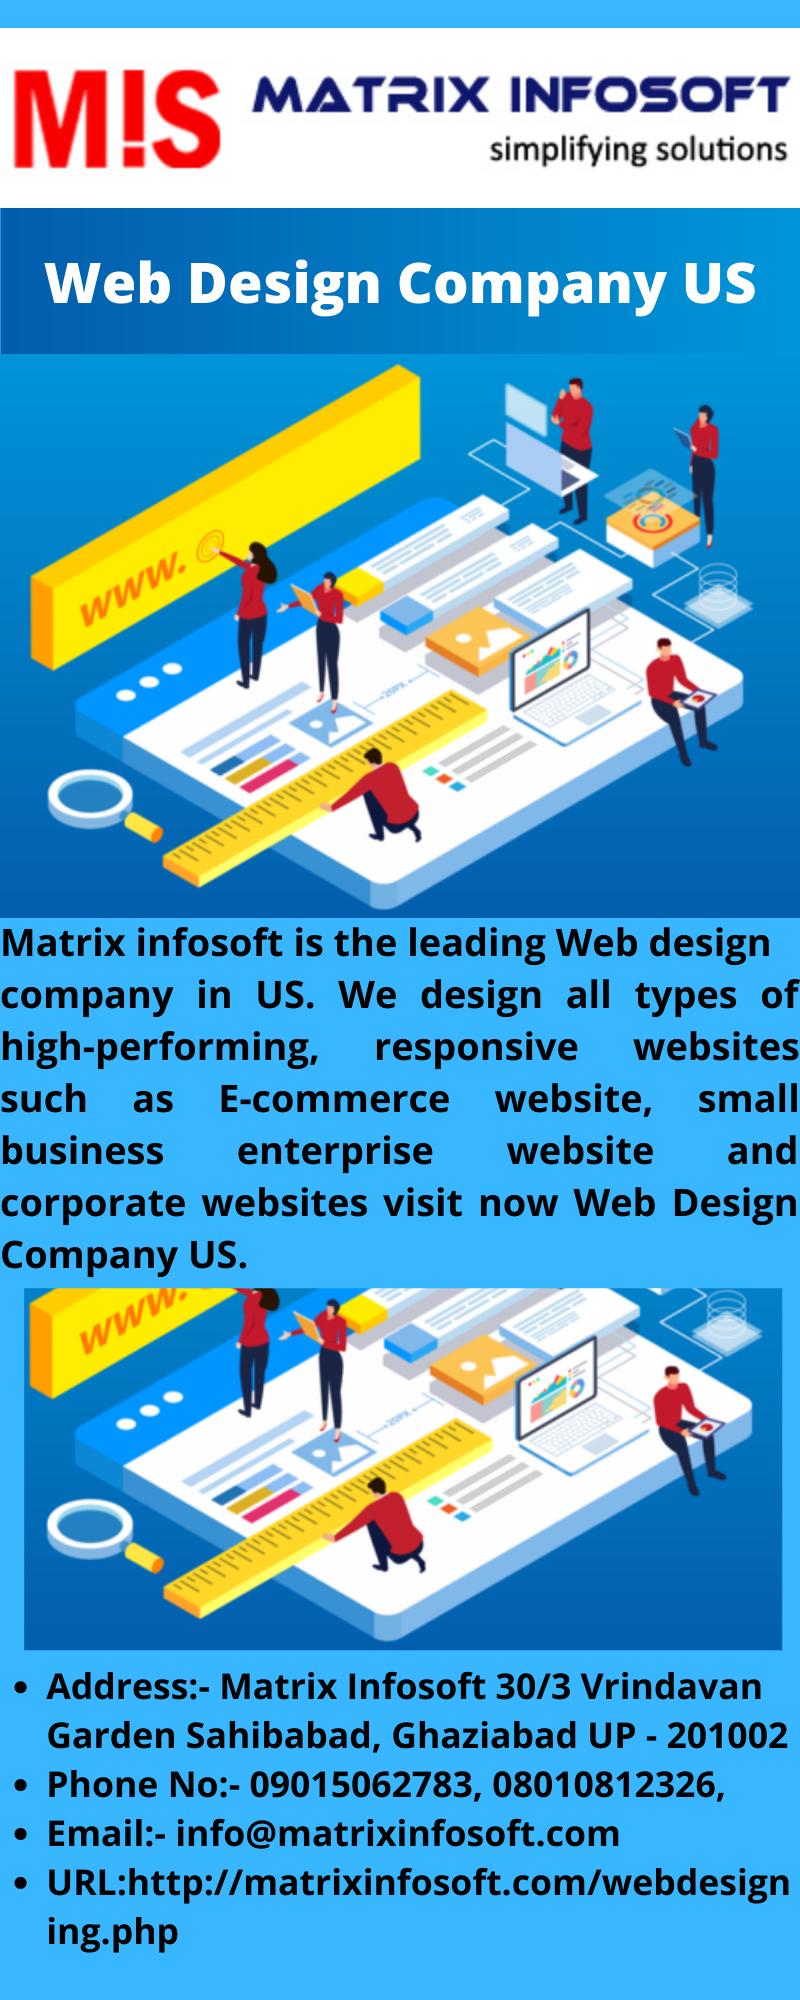 Web Design Company Us Matrix Infosoft Is The Leading Web Design Company In Us We Design All Types Of High Perform Web Design Company Web Design Design Company